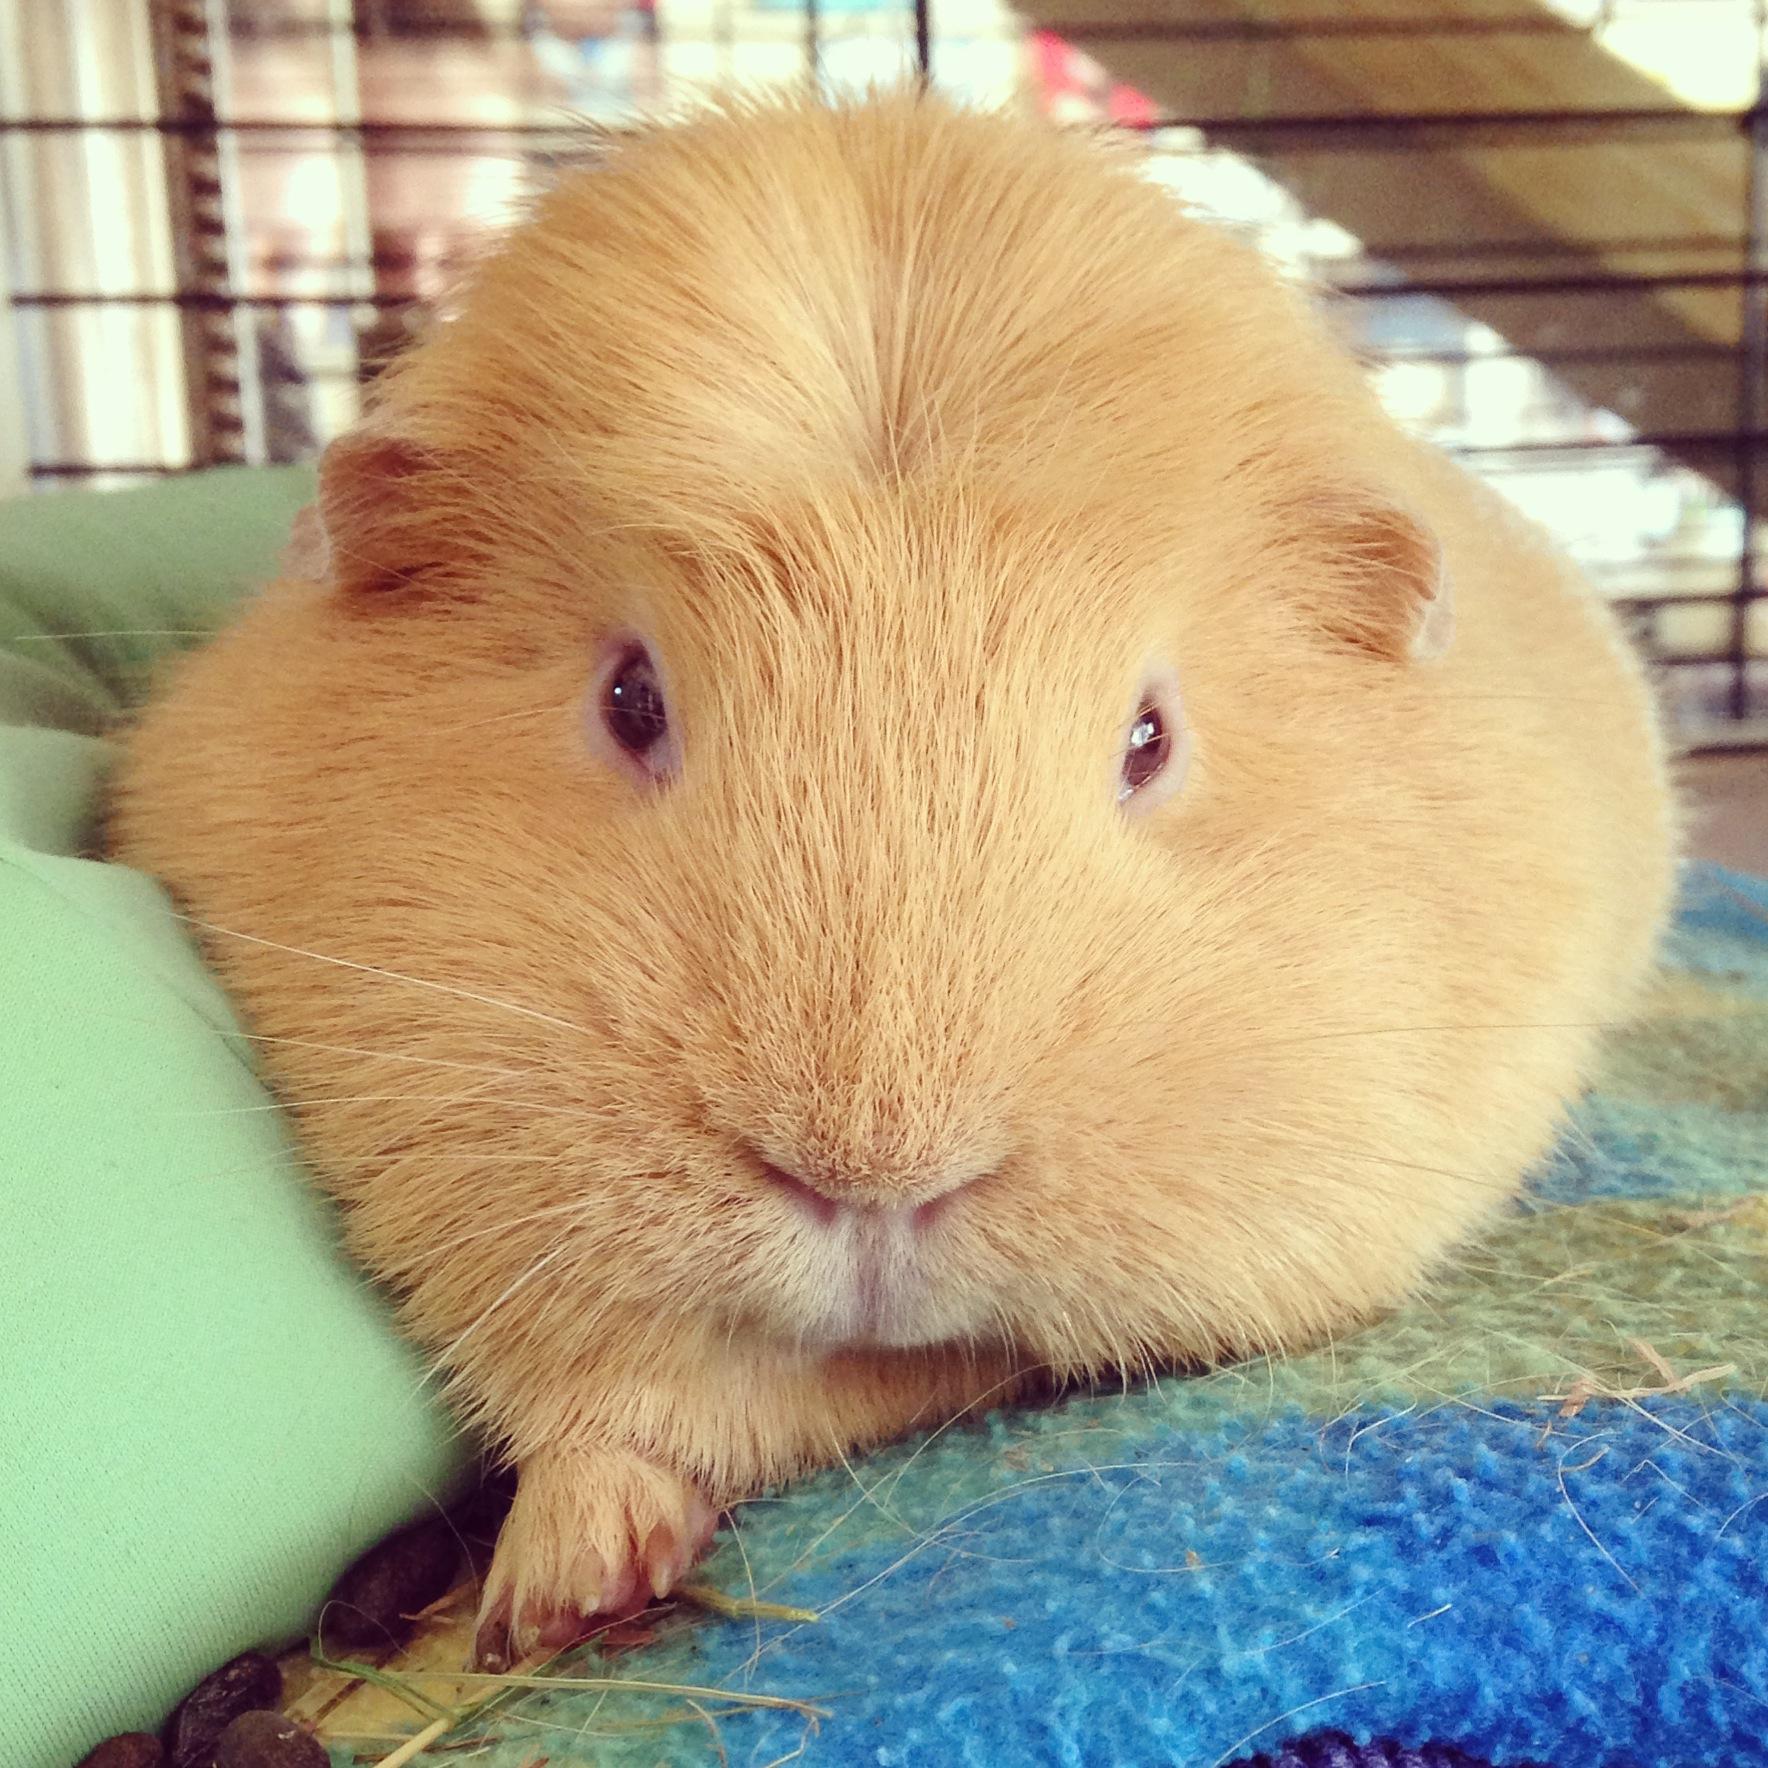 Crested guinea pig - photo#2